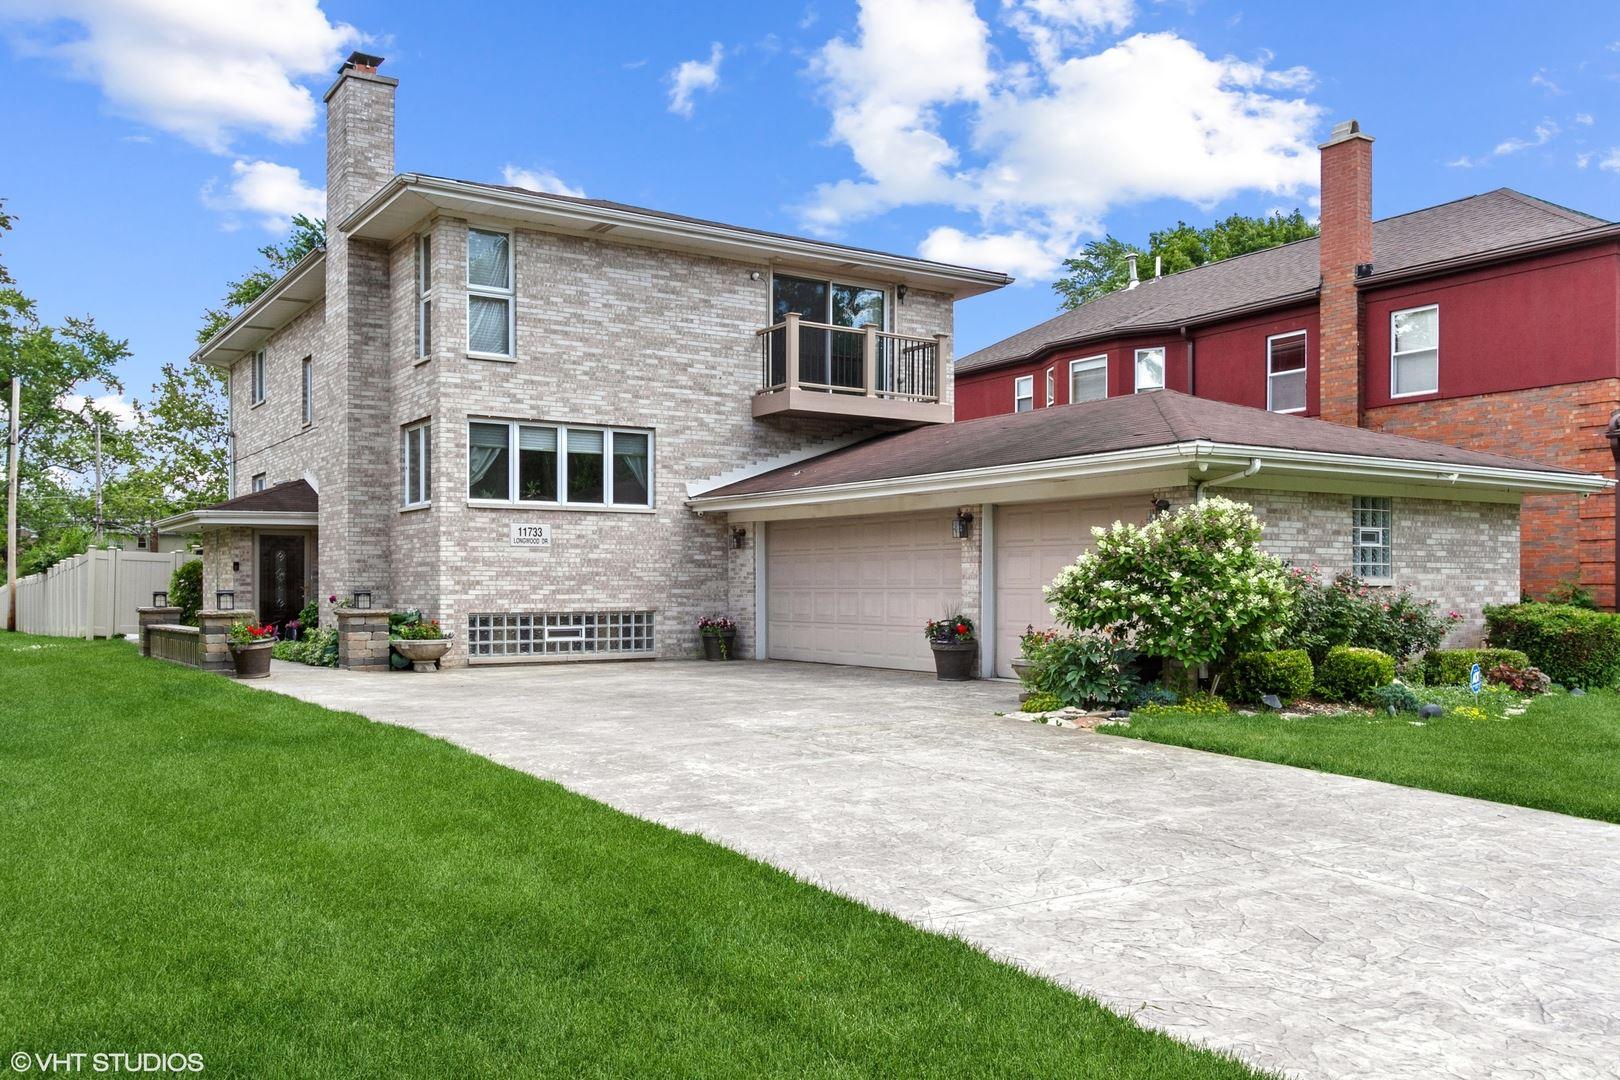 11733 S Longwood Drive, Chicago, IL 60643 - #: 11211748